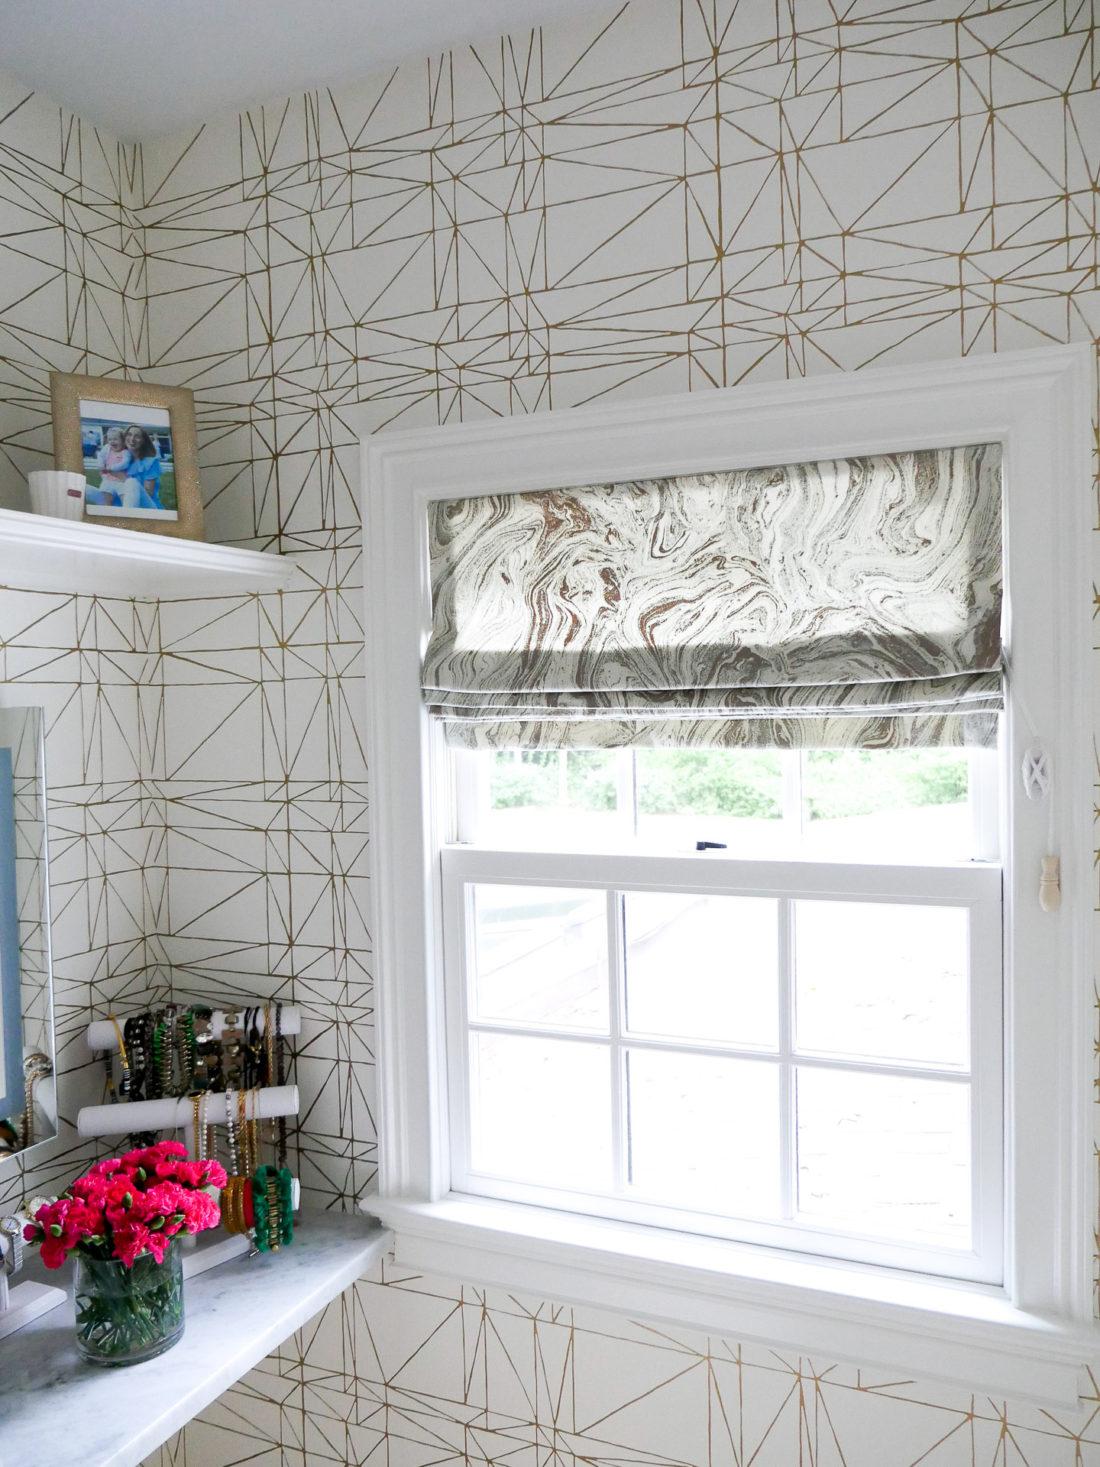 Details of Eva Amurri Martino's glam room in her connecticut home